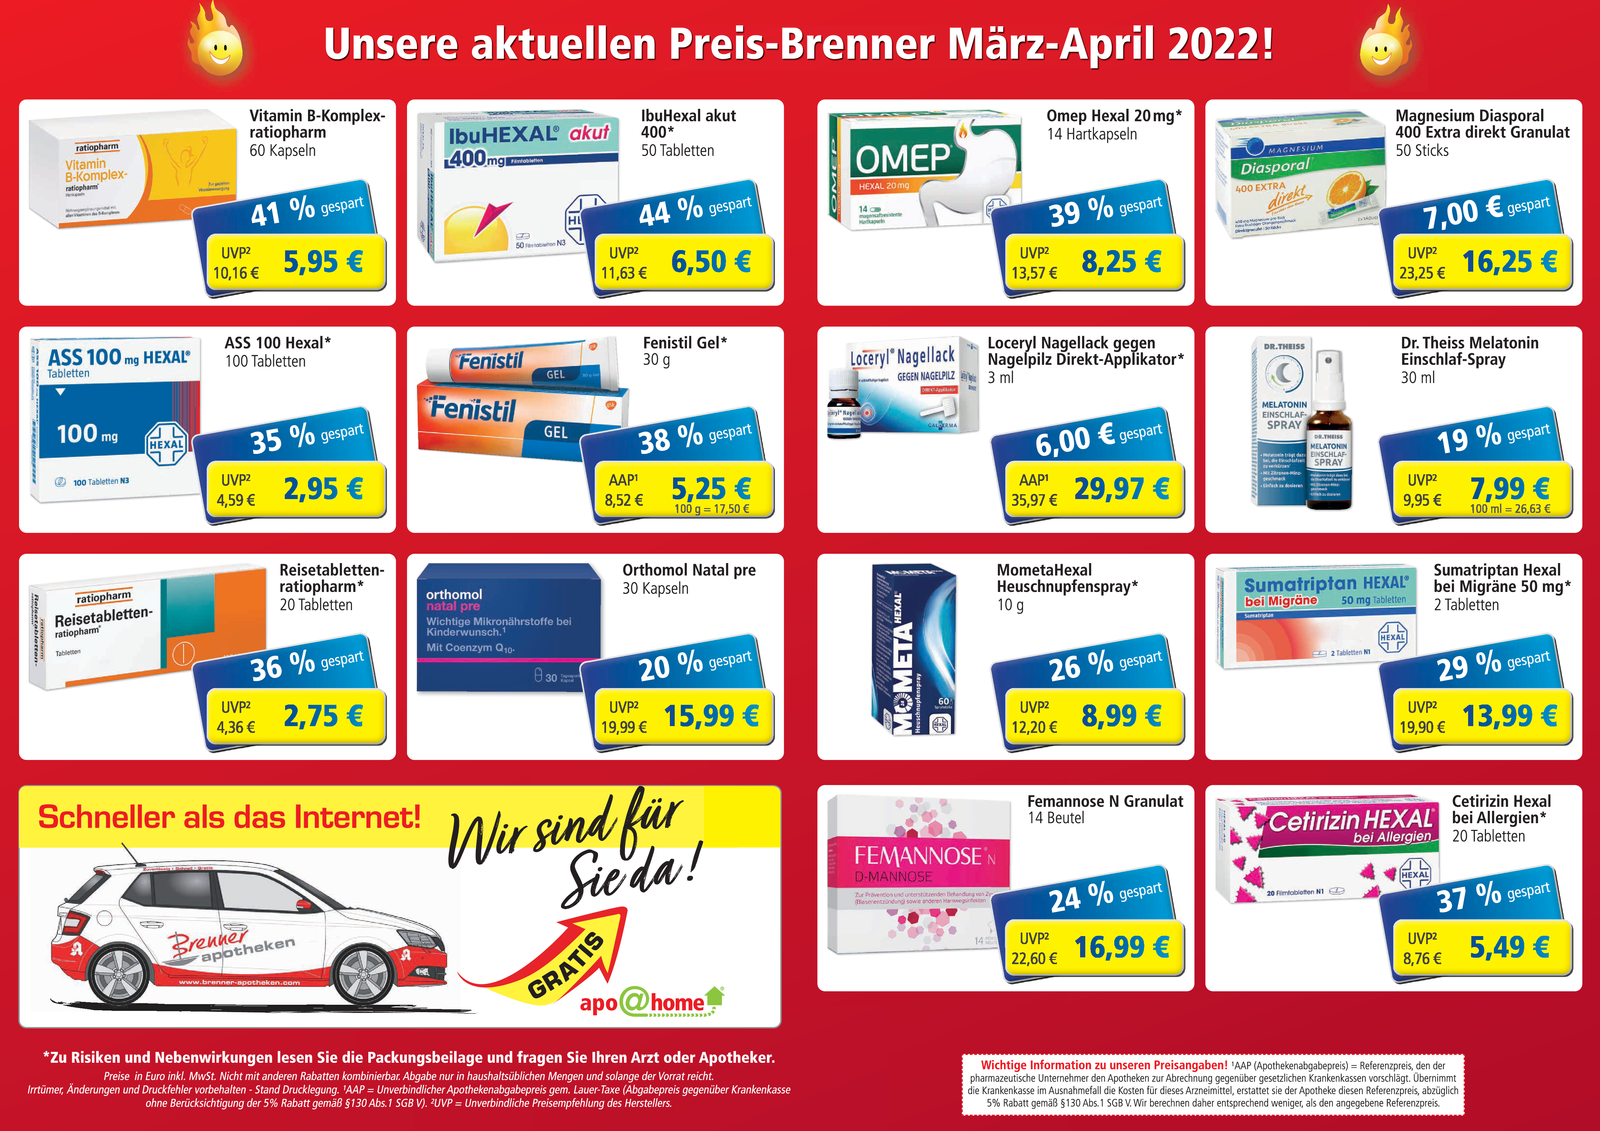 https://mein-uploads.apocdn.net/22640/leaflets/22640_flyer-Seite2.png